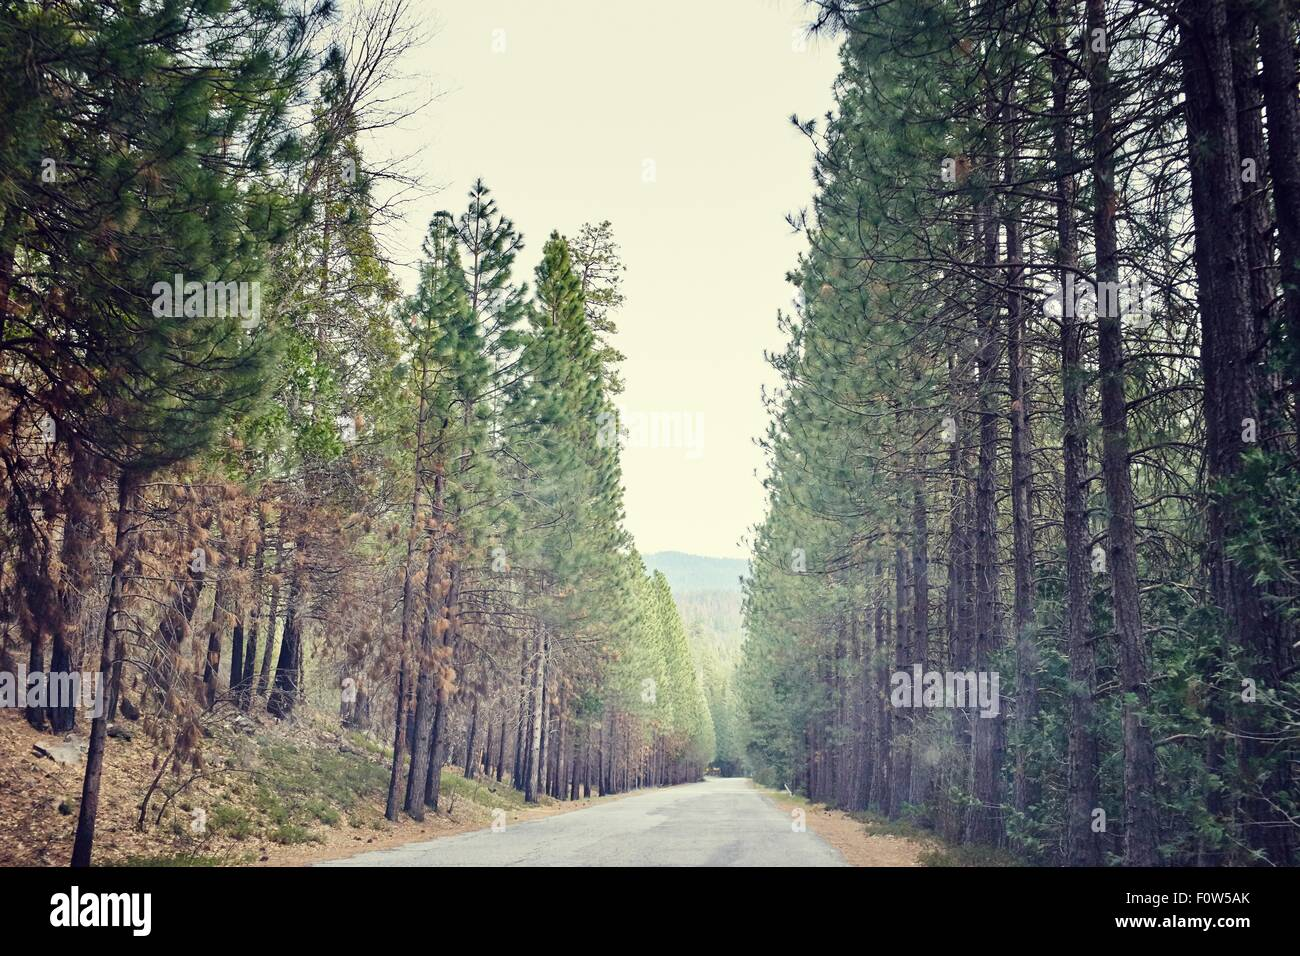 Tree lined road, Yosemite National Park, California, USA - Stock Image